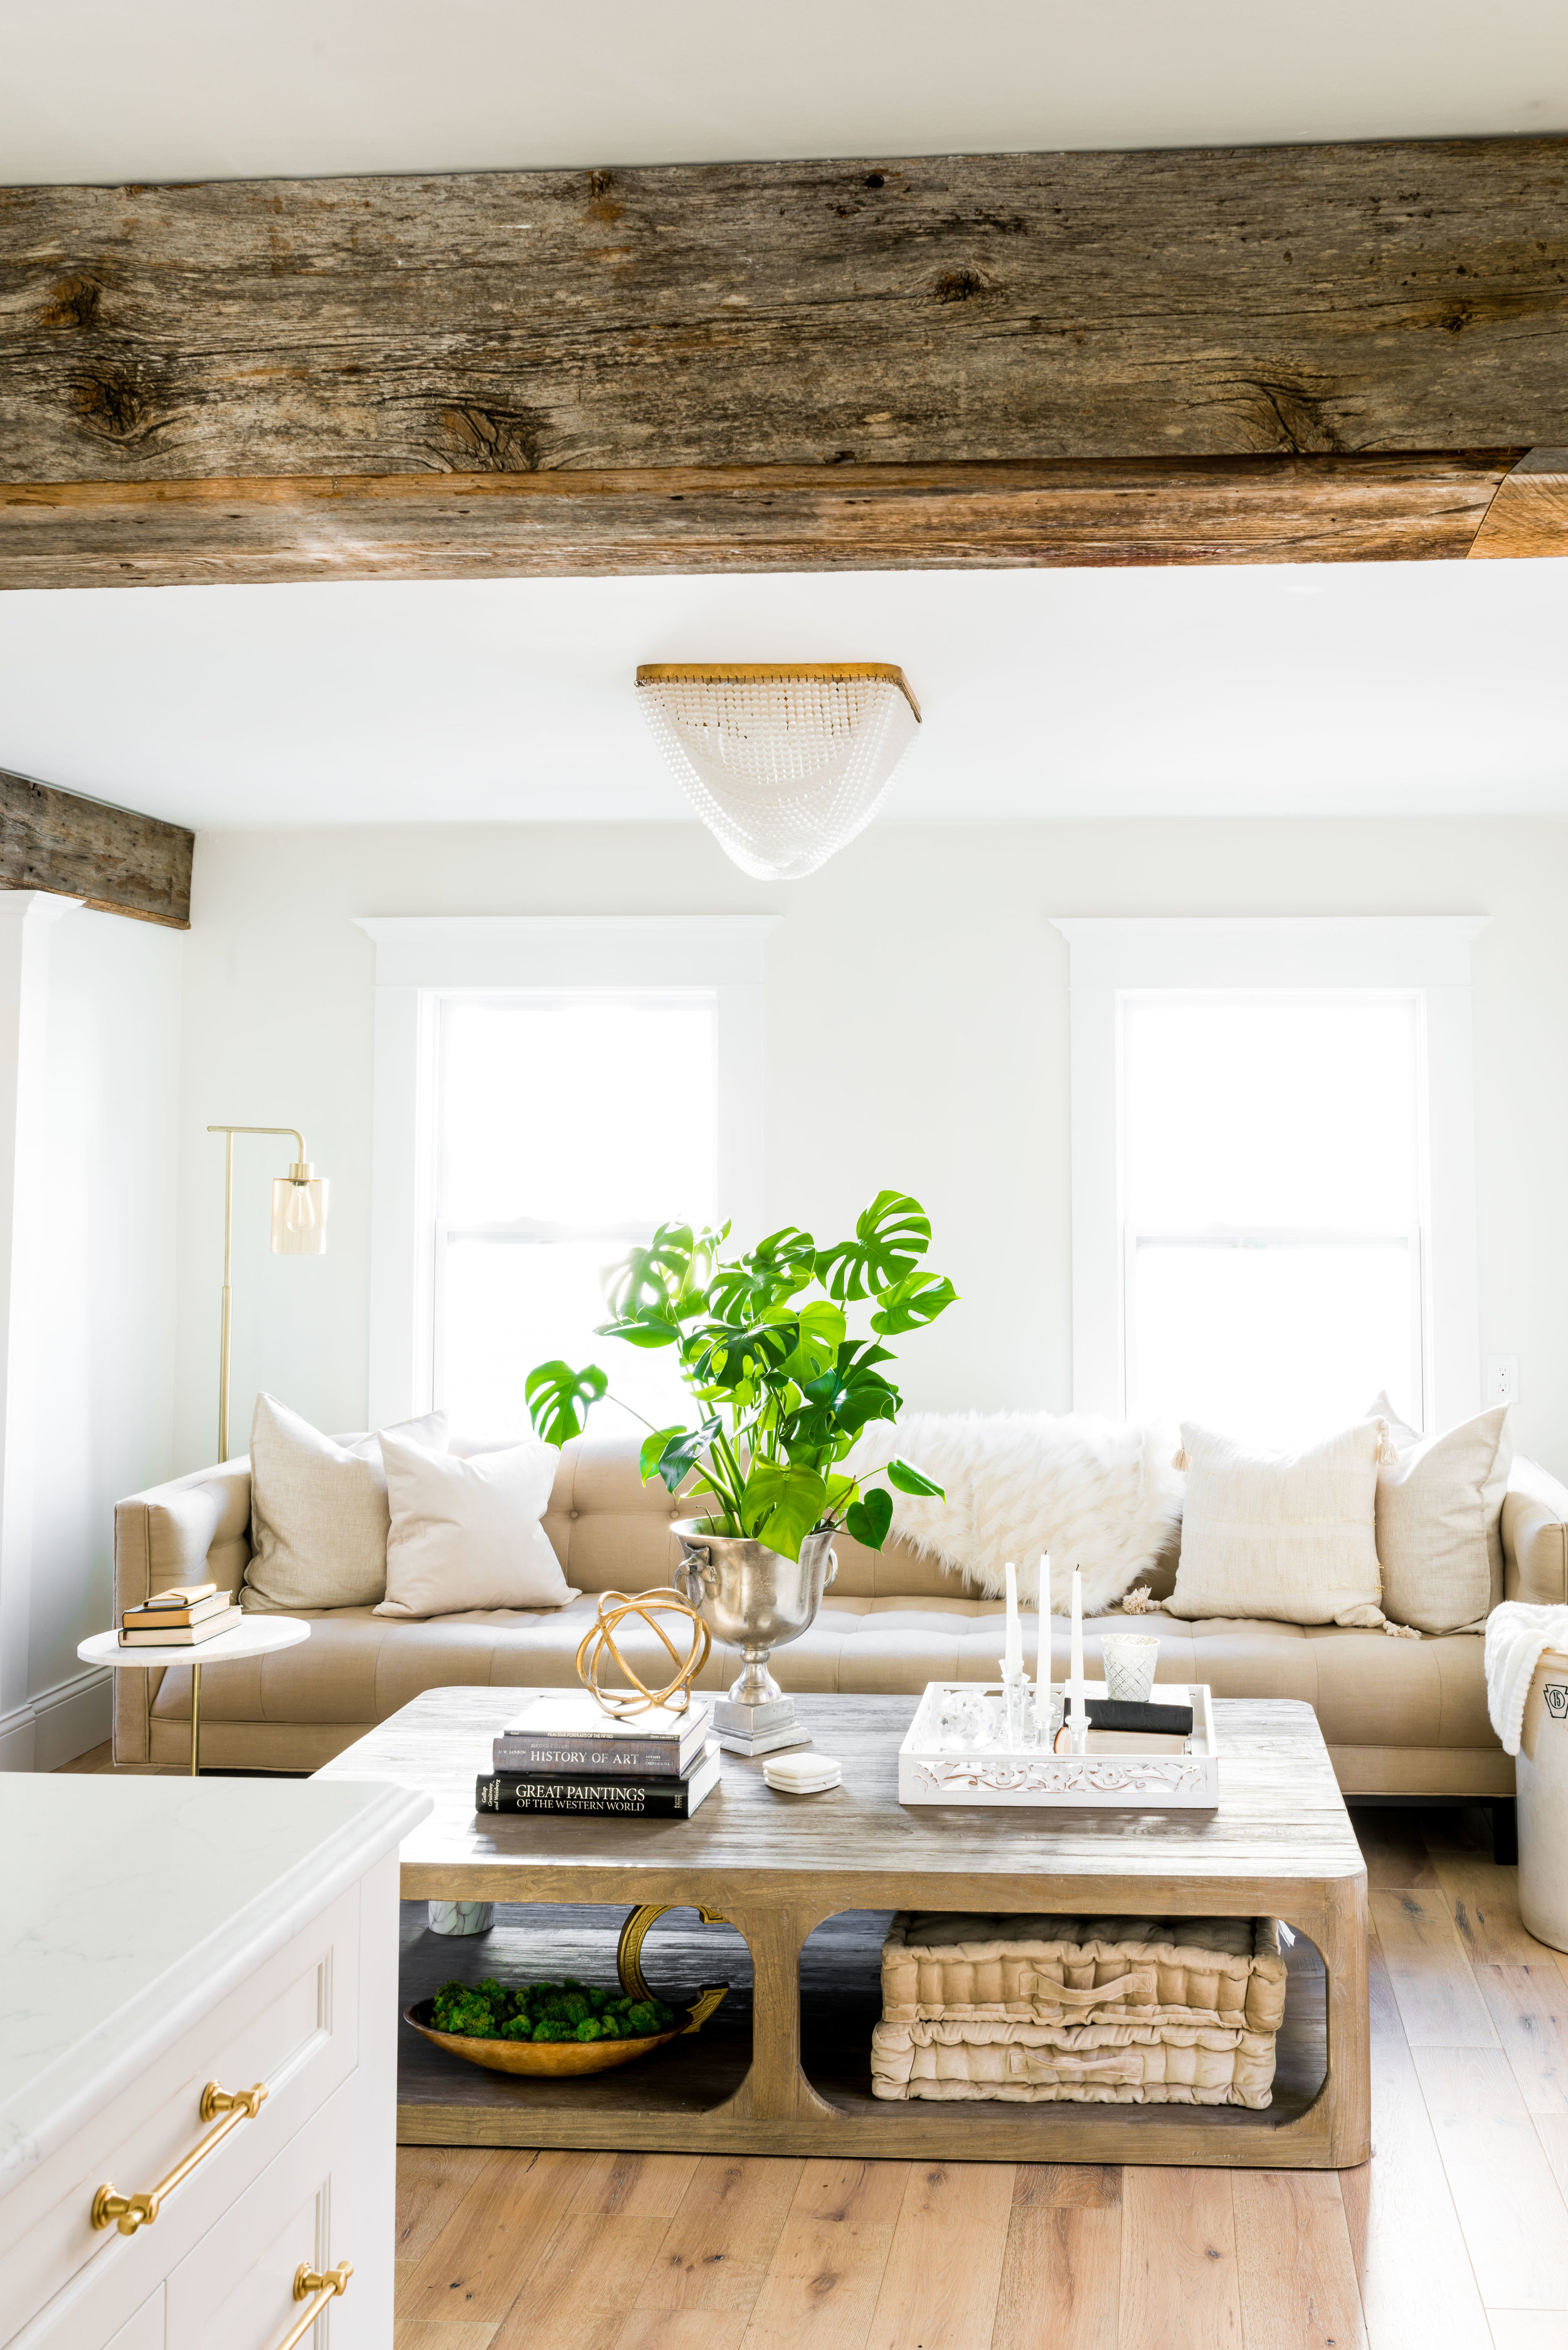 Livingroom light fixture was found on  Horchow . Design:  Molly Pidgeon, Principal & Interior Designer, House of Dietrich  // Photo:  Jessica Delaney